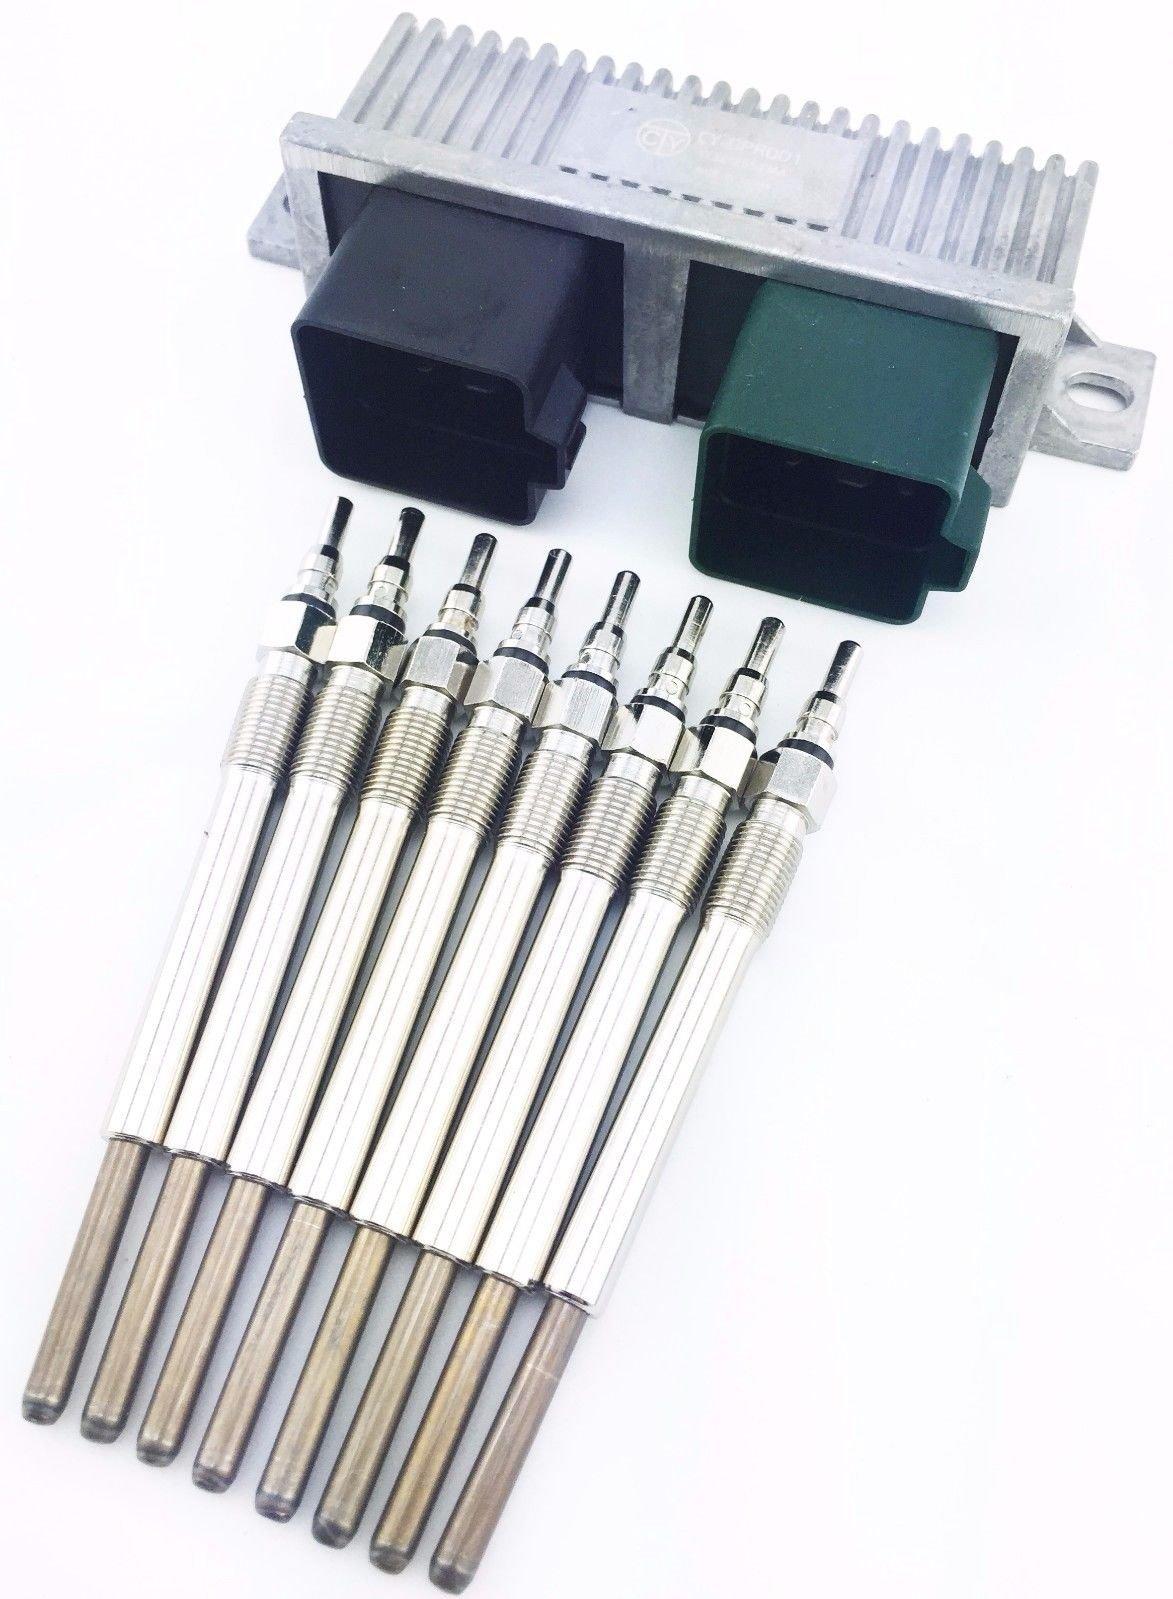 Aftermarket 02-03 FORD POWERSTROKE 7.3L 7.3 TURBO DIESEL 8 GLOW PLUGS & GPCM CONTROL MODULE